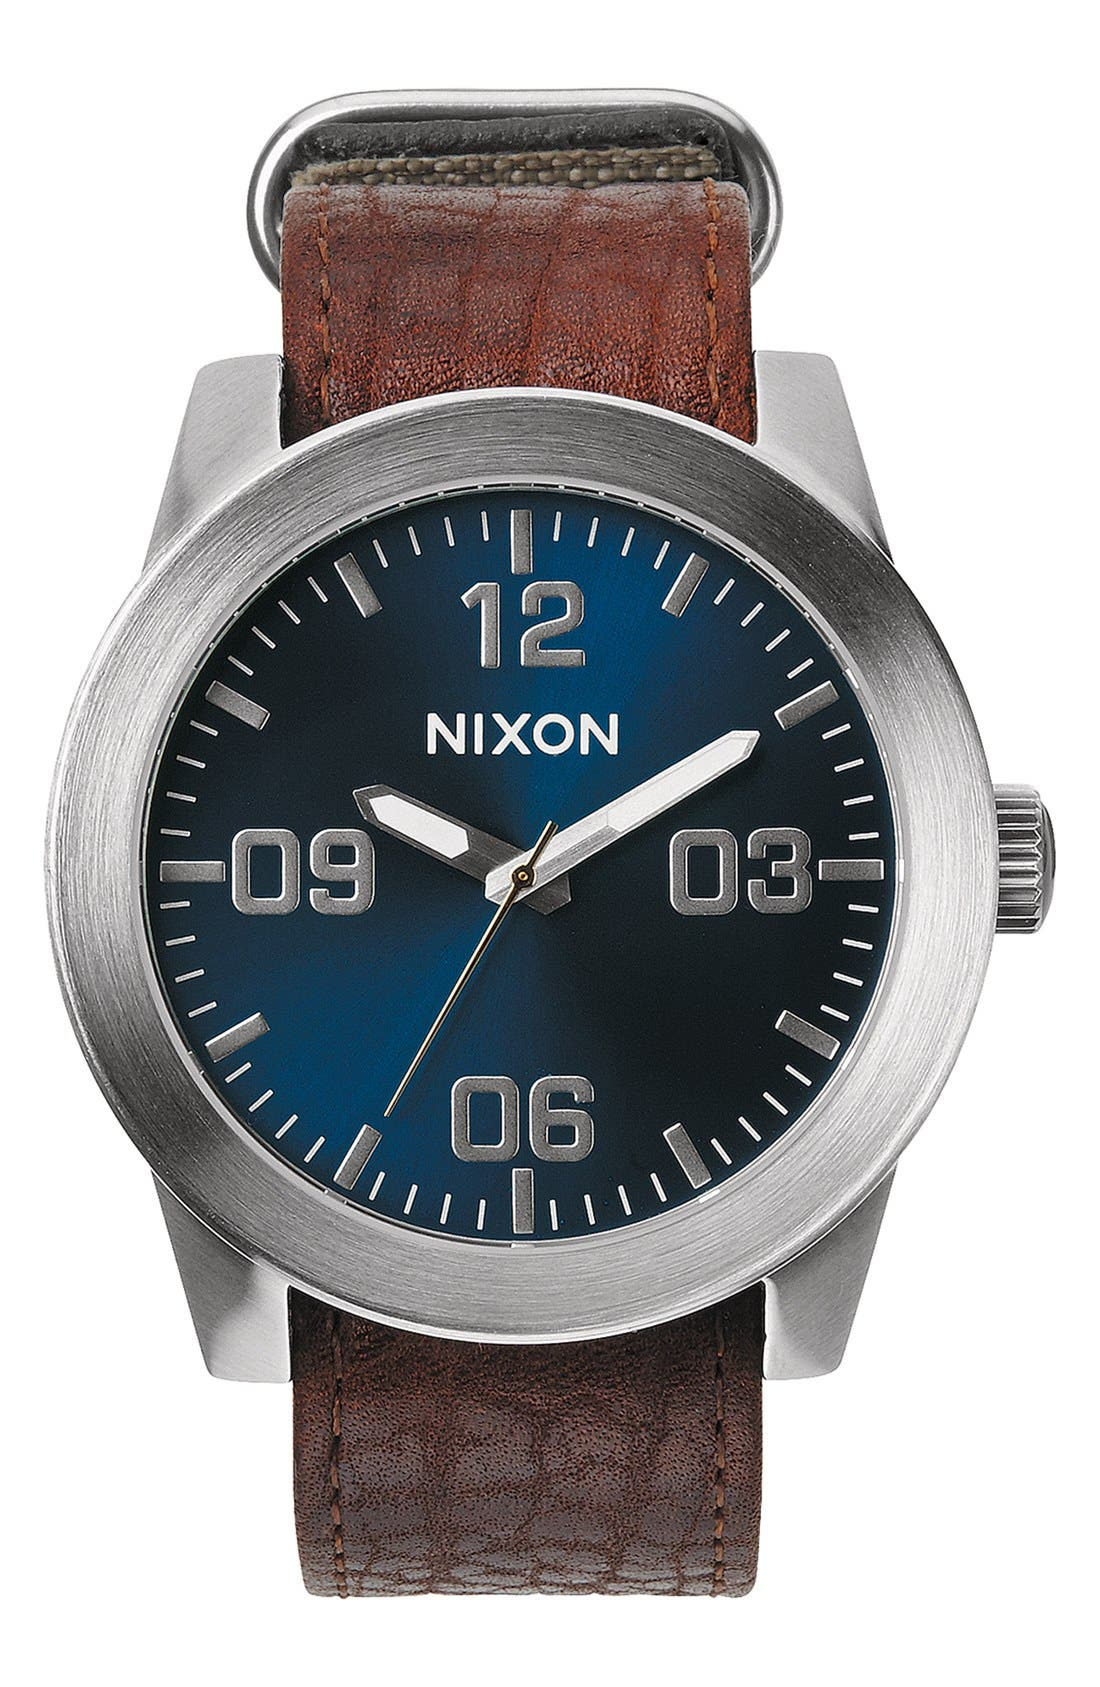 Main Image - Nixon 'The Corporal' Watch, 48mm